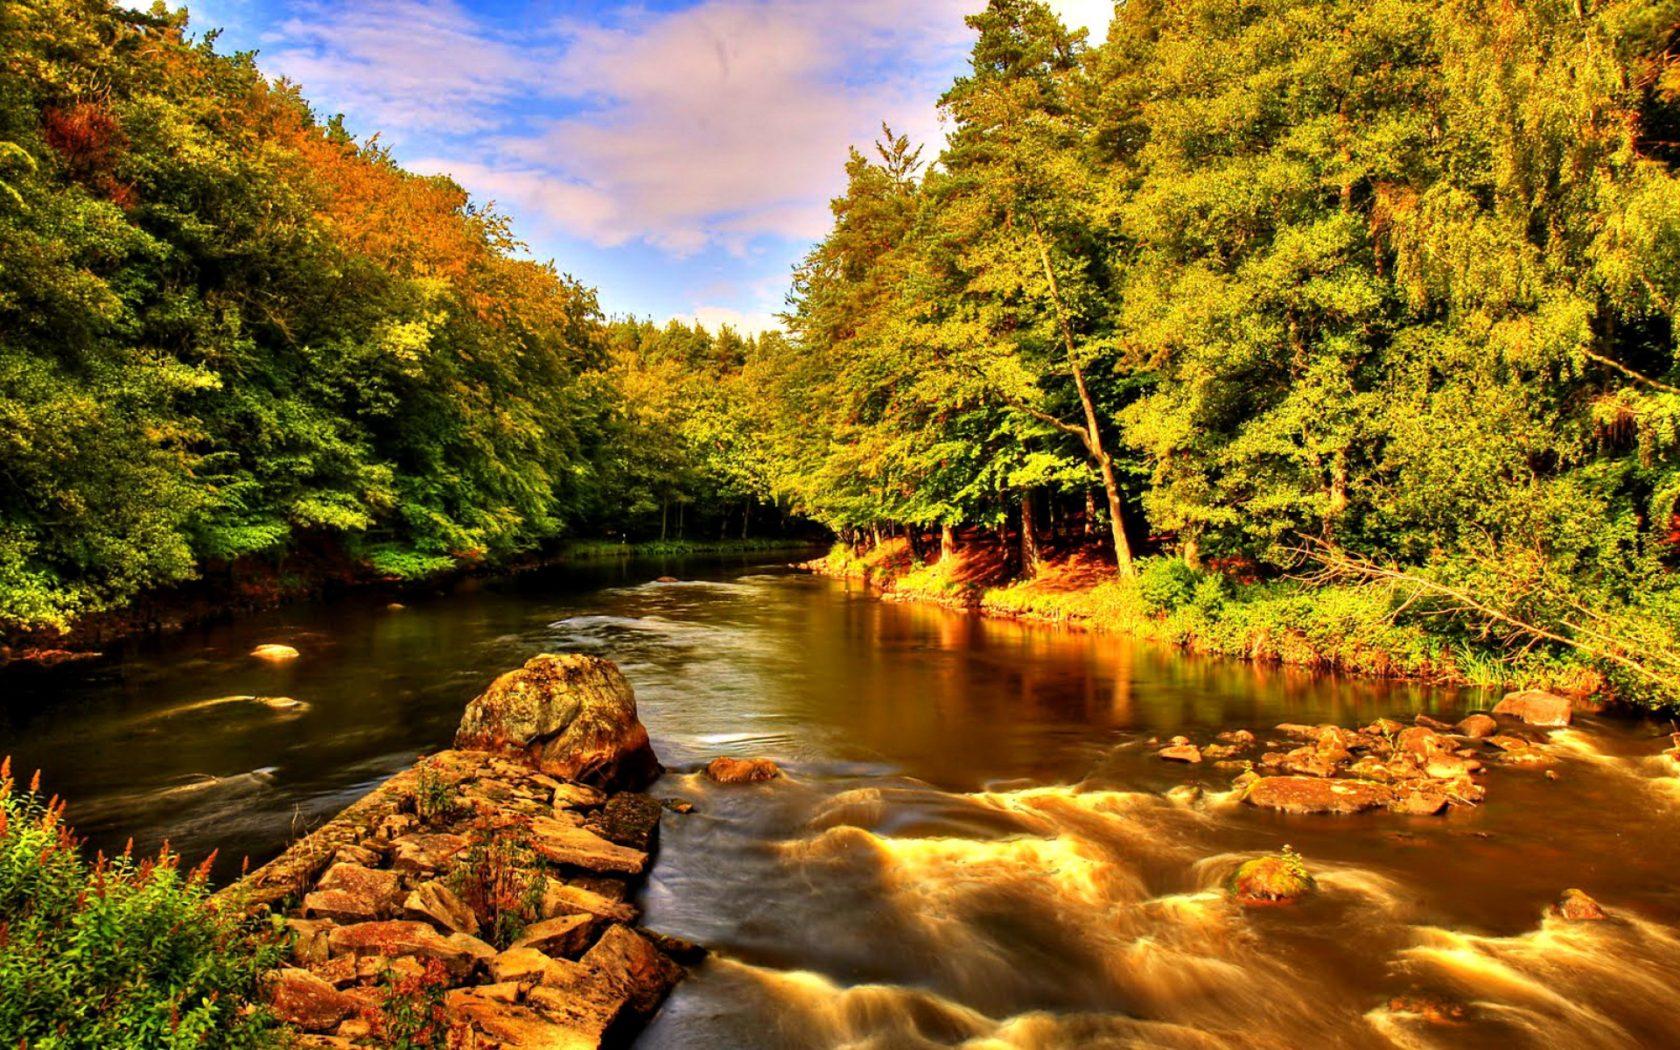 Beautiful Nature Summer River Creek Shore Trees Rocks